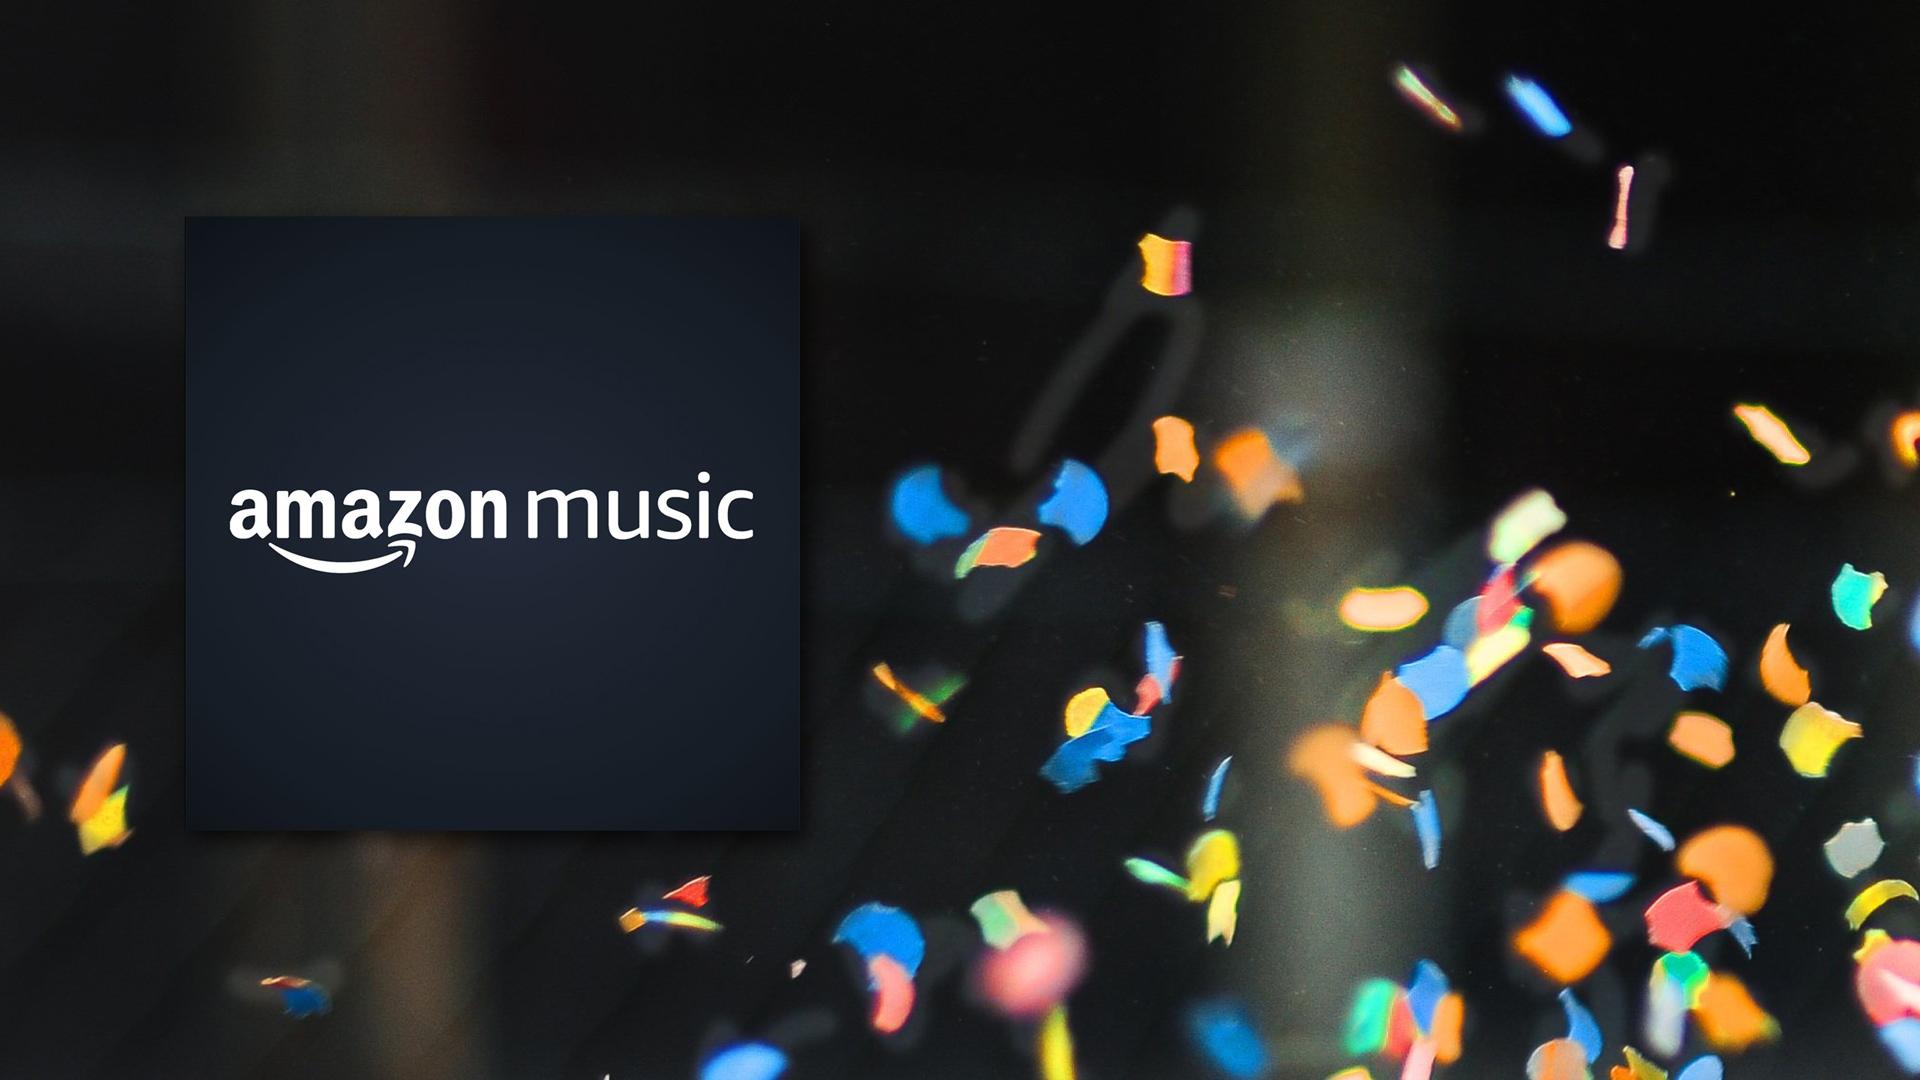 Listen to DEEPINSIDE on all platforms